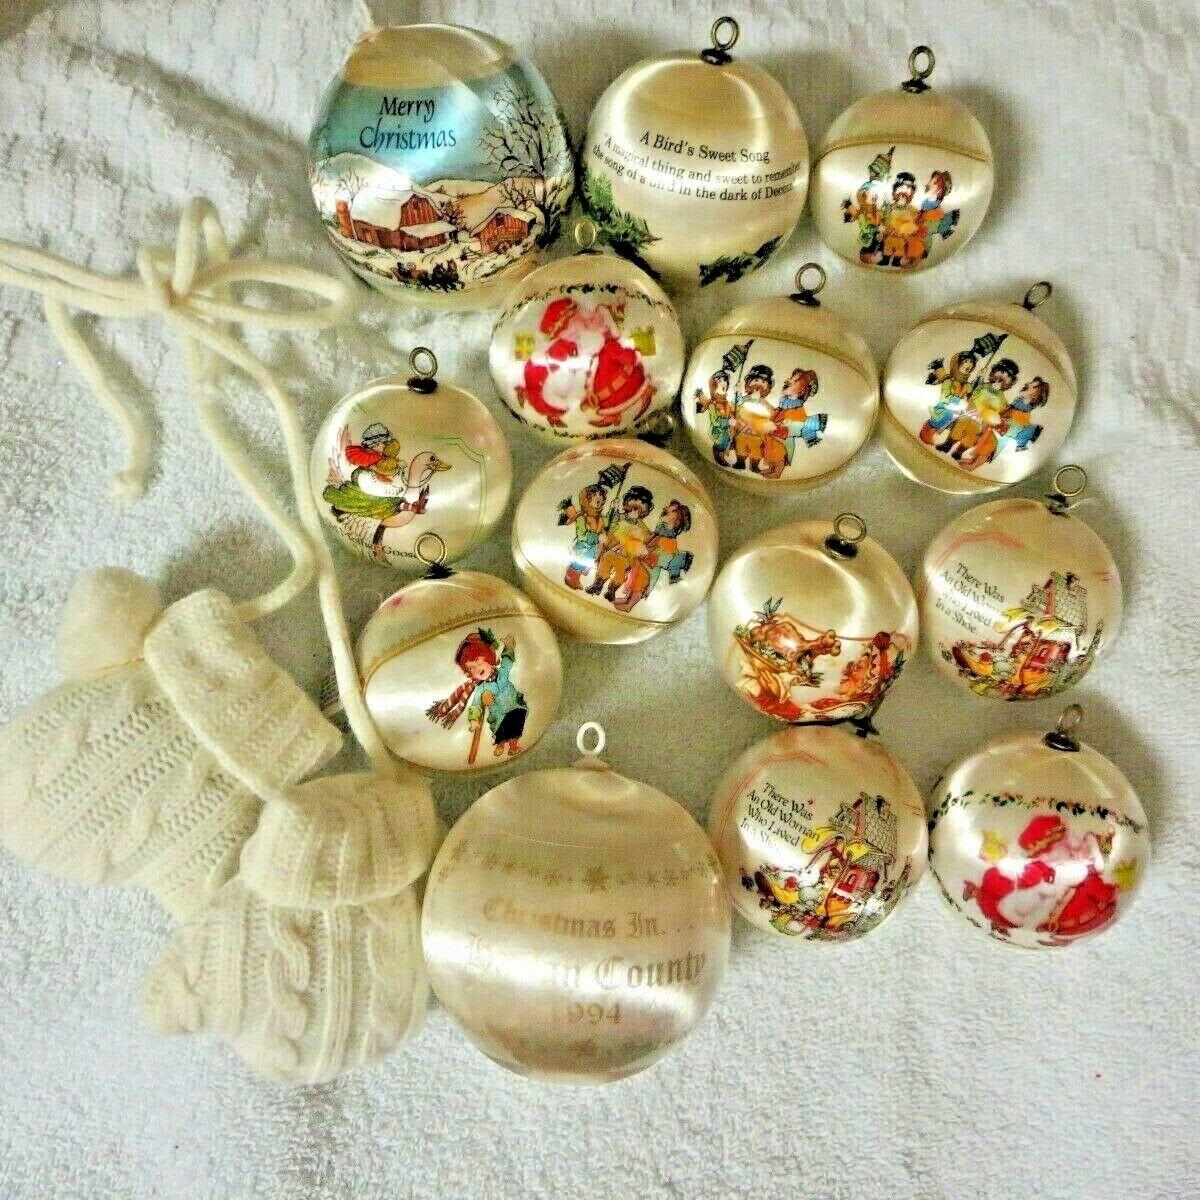 Vintage Christmas Ornament Lot Spun Carolers Mother Goose Etsy In 2020 Christmas Ornaments Vintage Christmas Ornaments Vintage Christmas